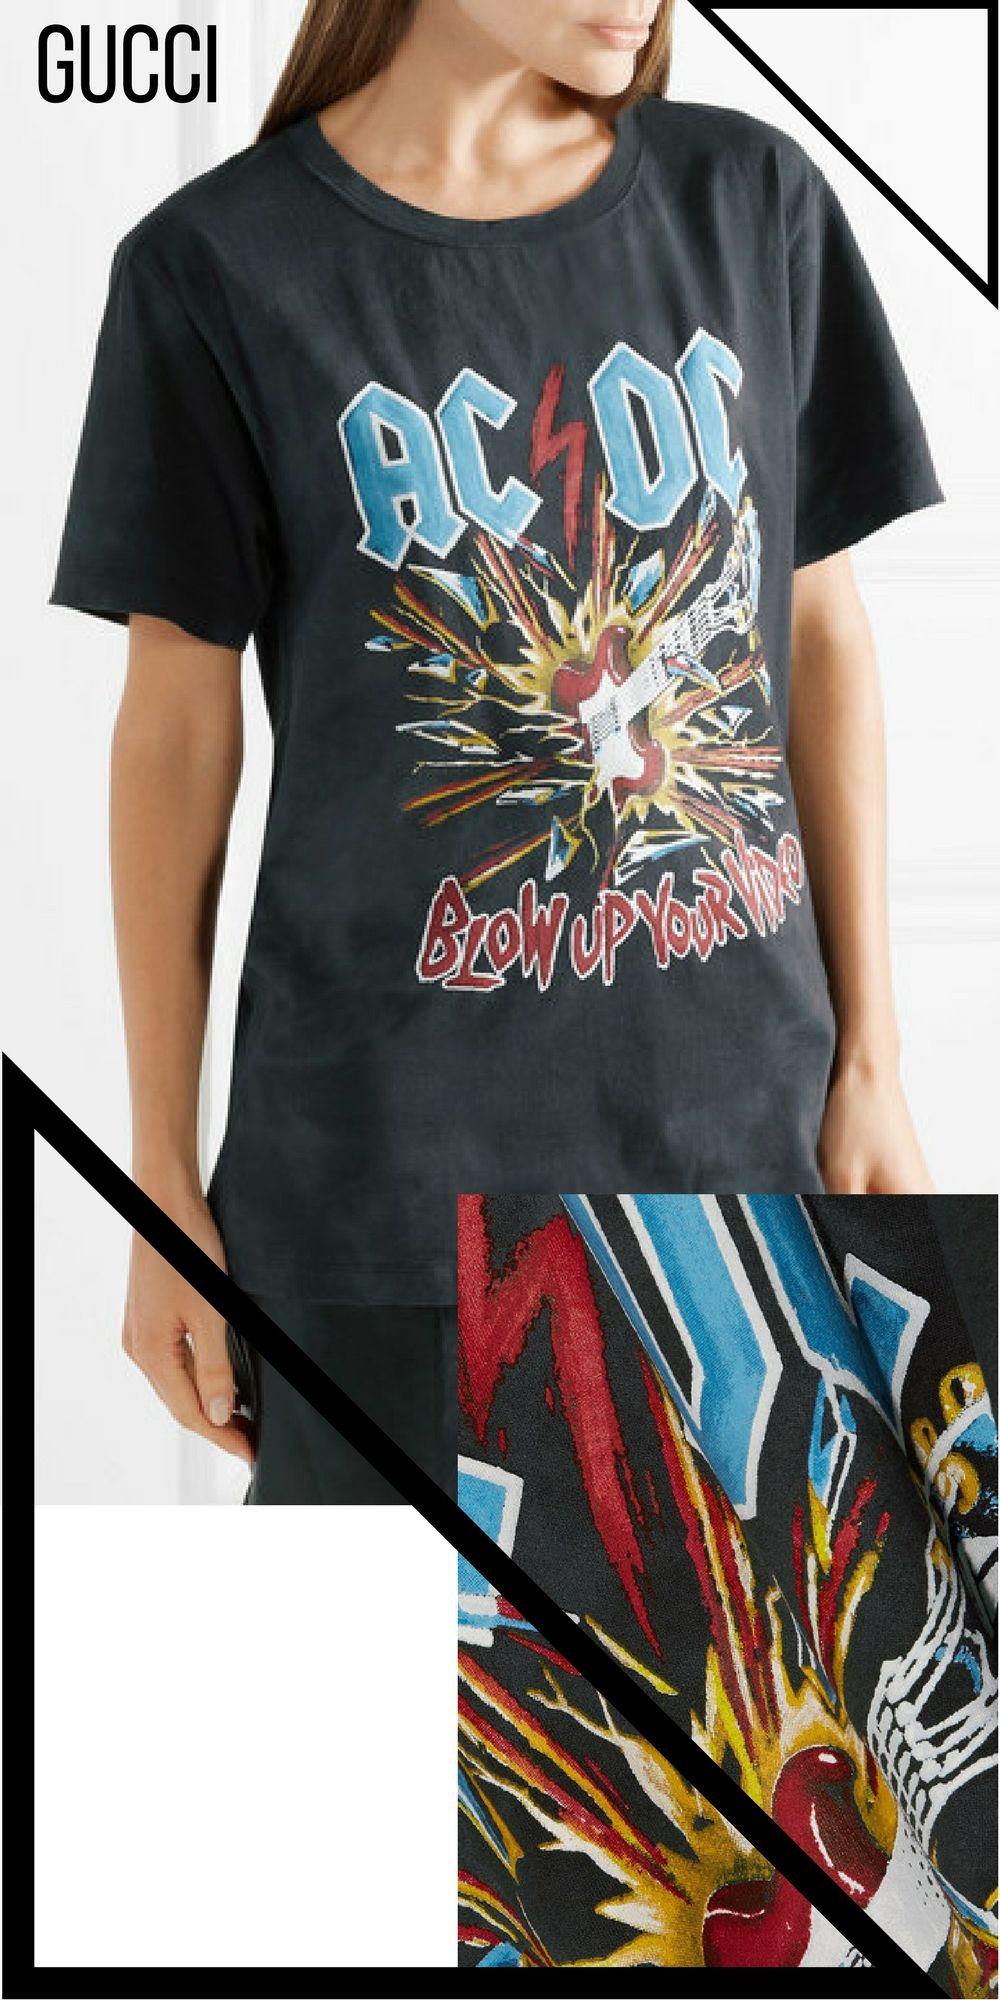 a90184da3055 Gucci - Printed Tie-dyed Cotton-jersey T-shirt - Charcoal, 70s fashion,  band shirt, AC/DC, #ad, #affiliate